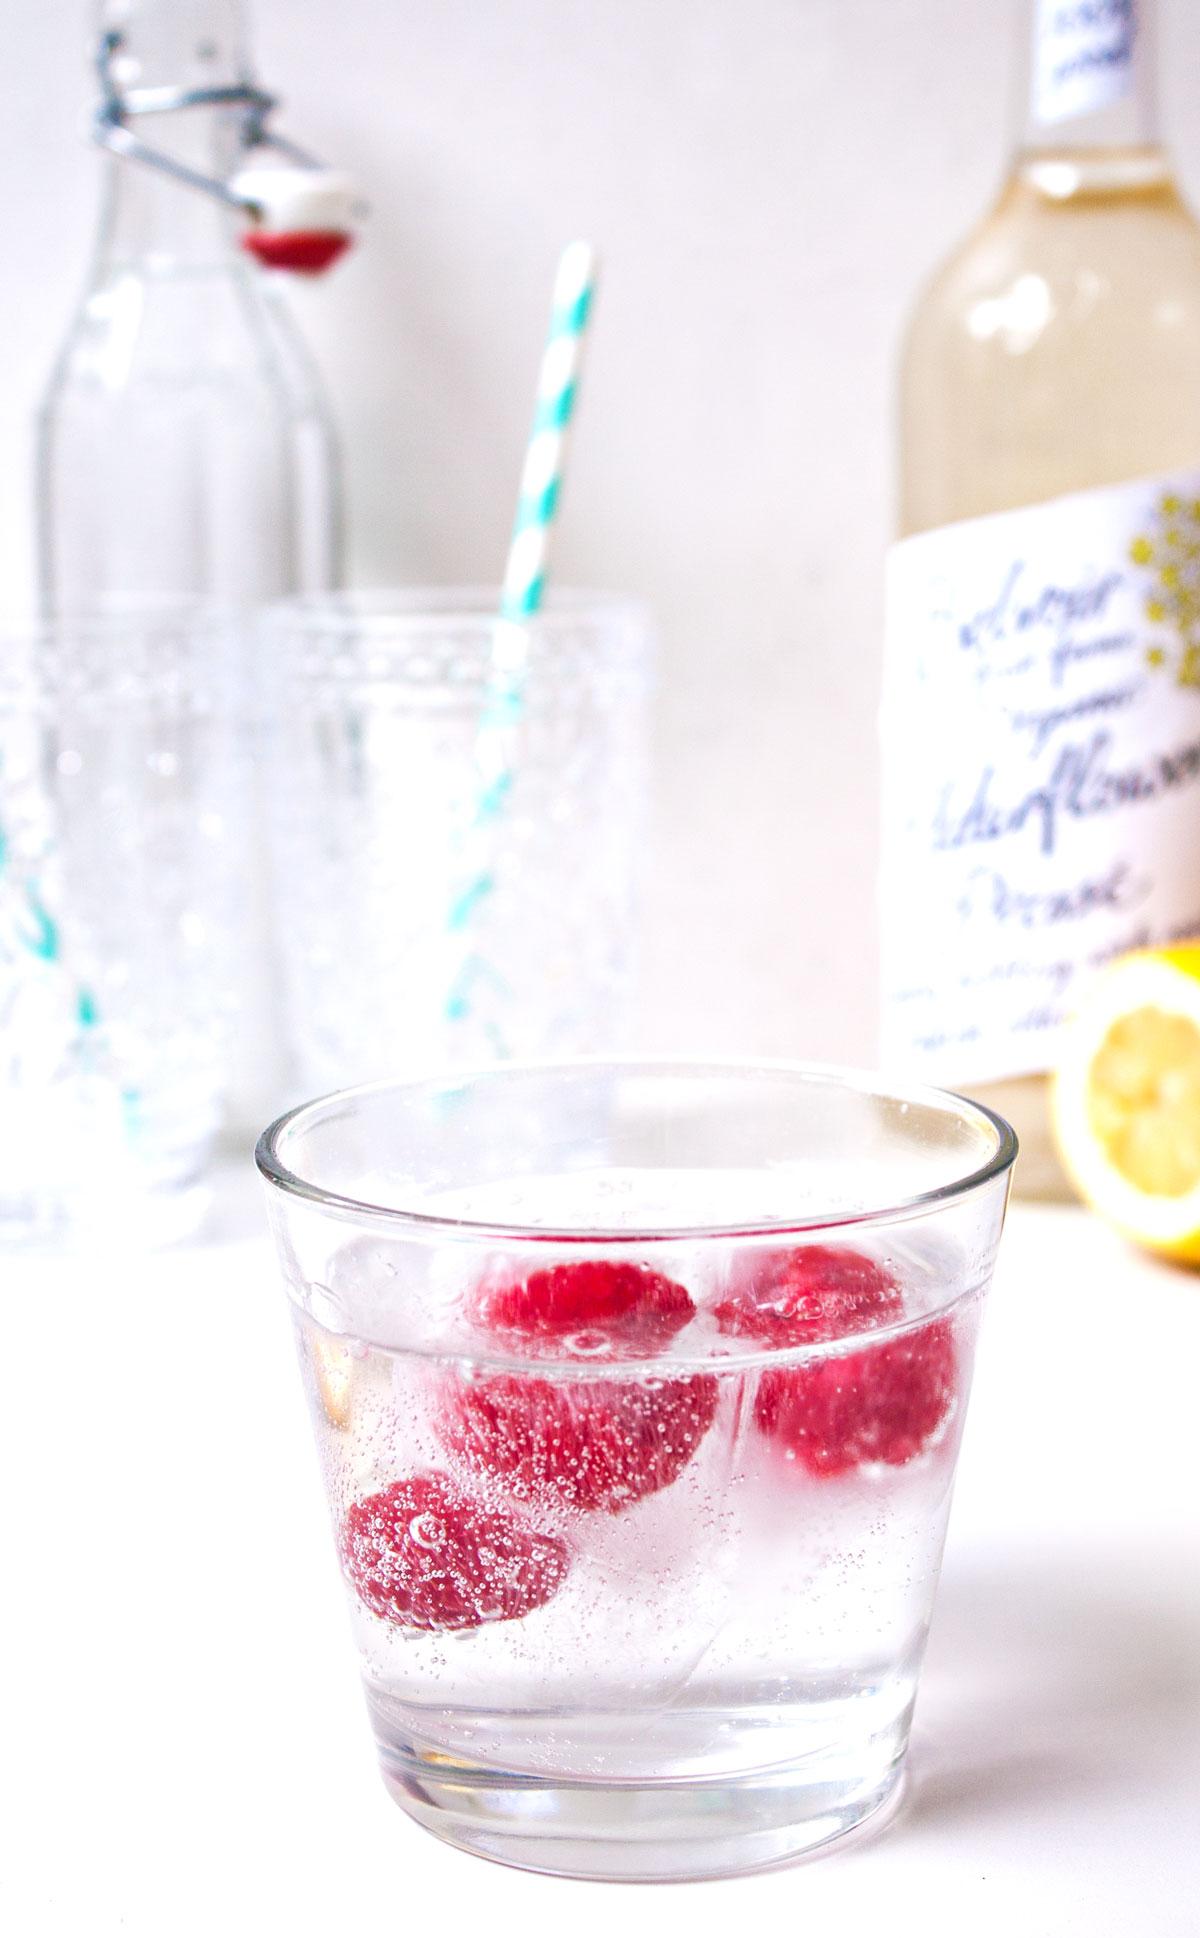 ice_cubes_fruit